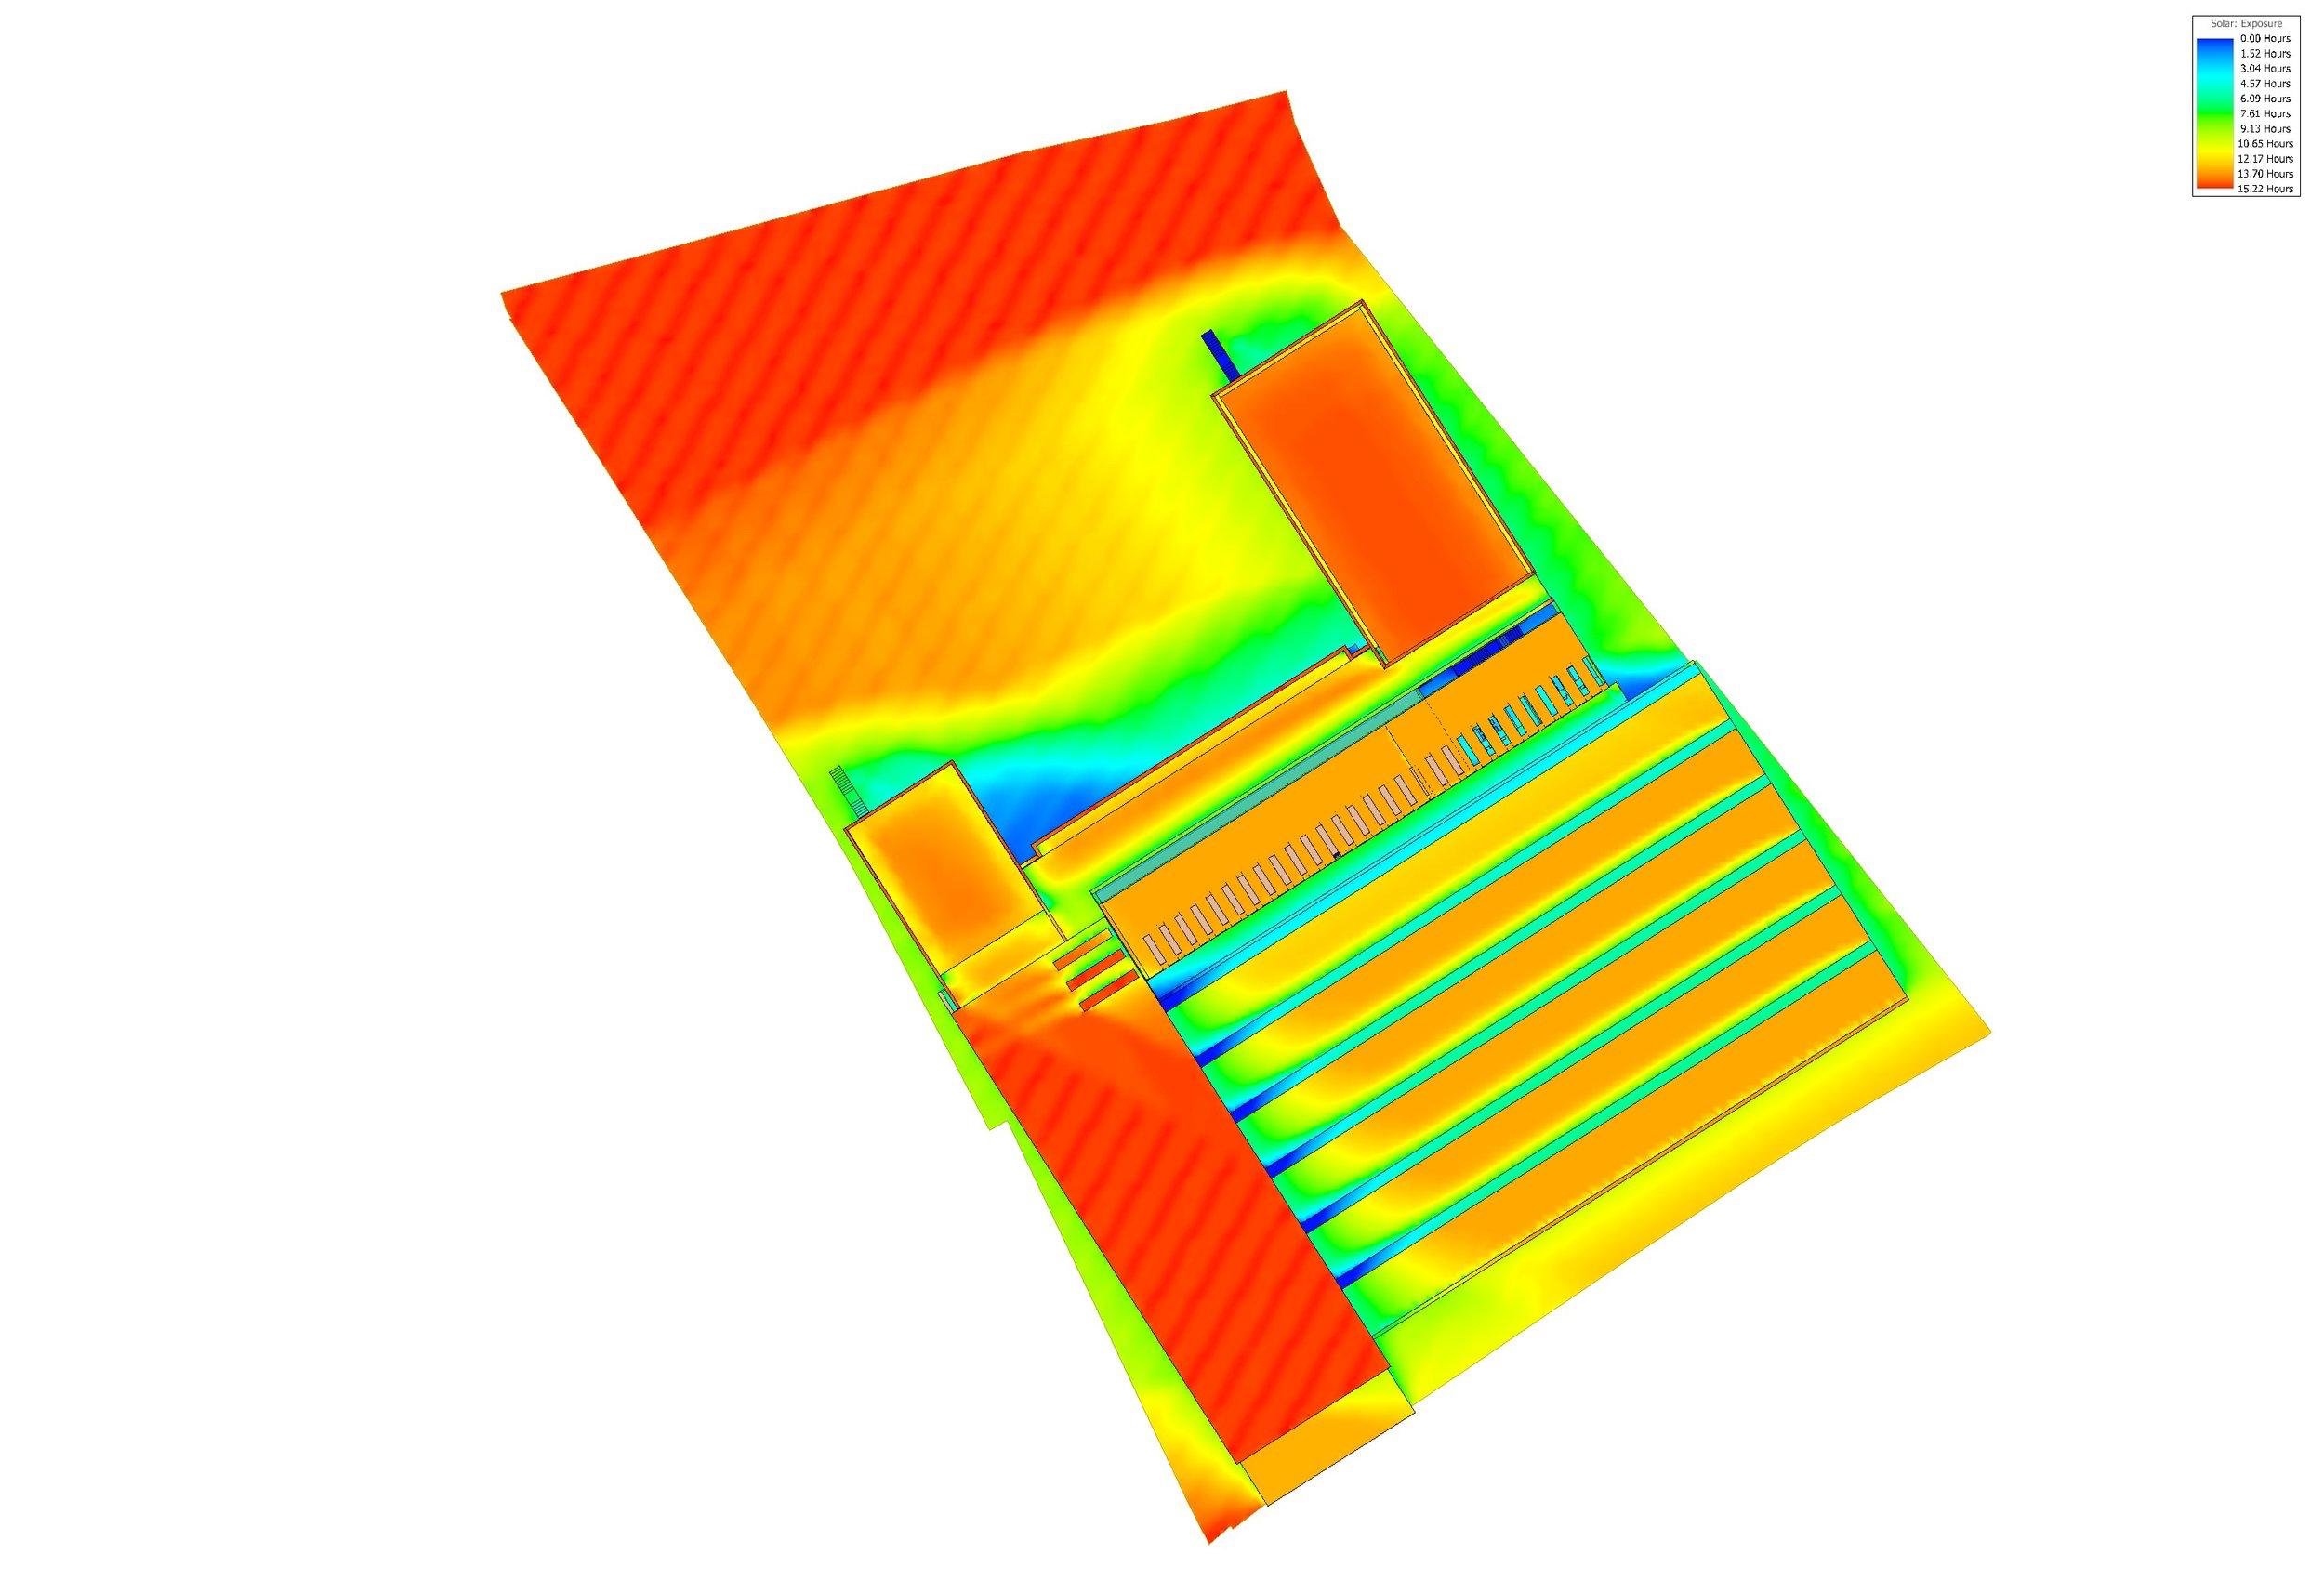 RGSS_model_Option1_merged_Solar_summer.jpg